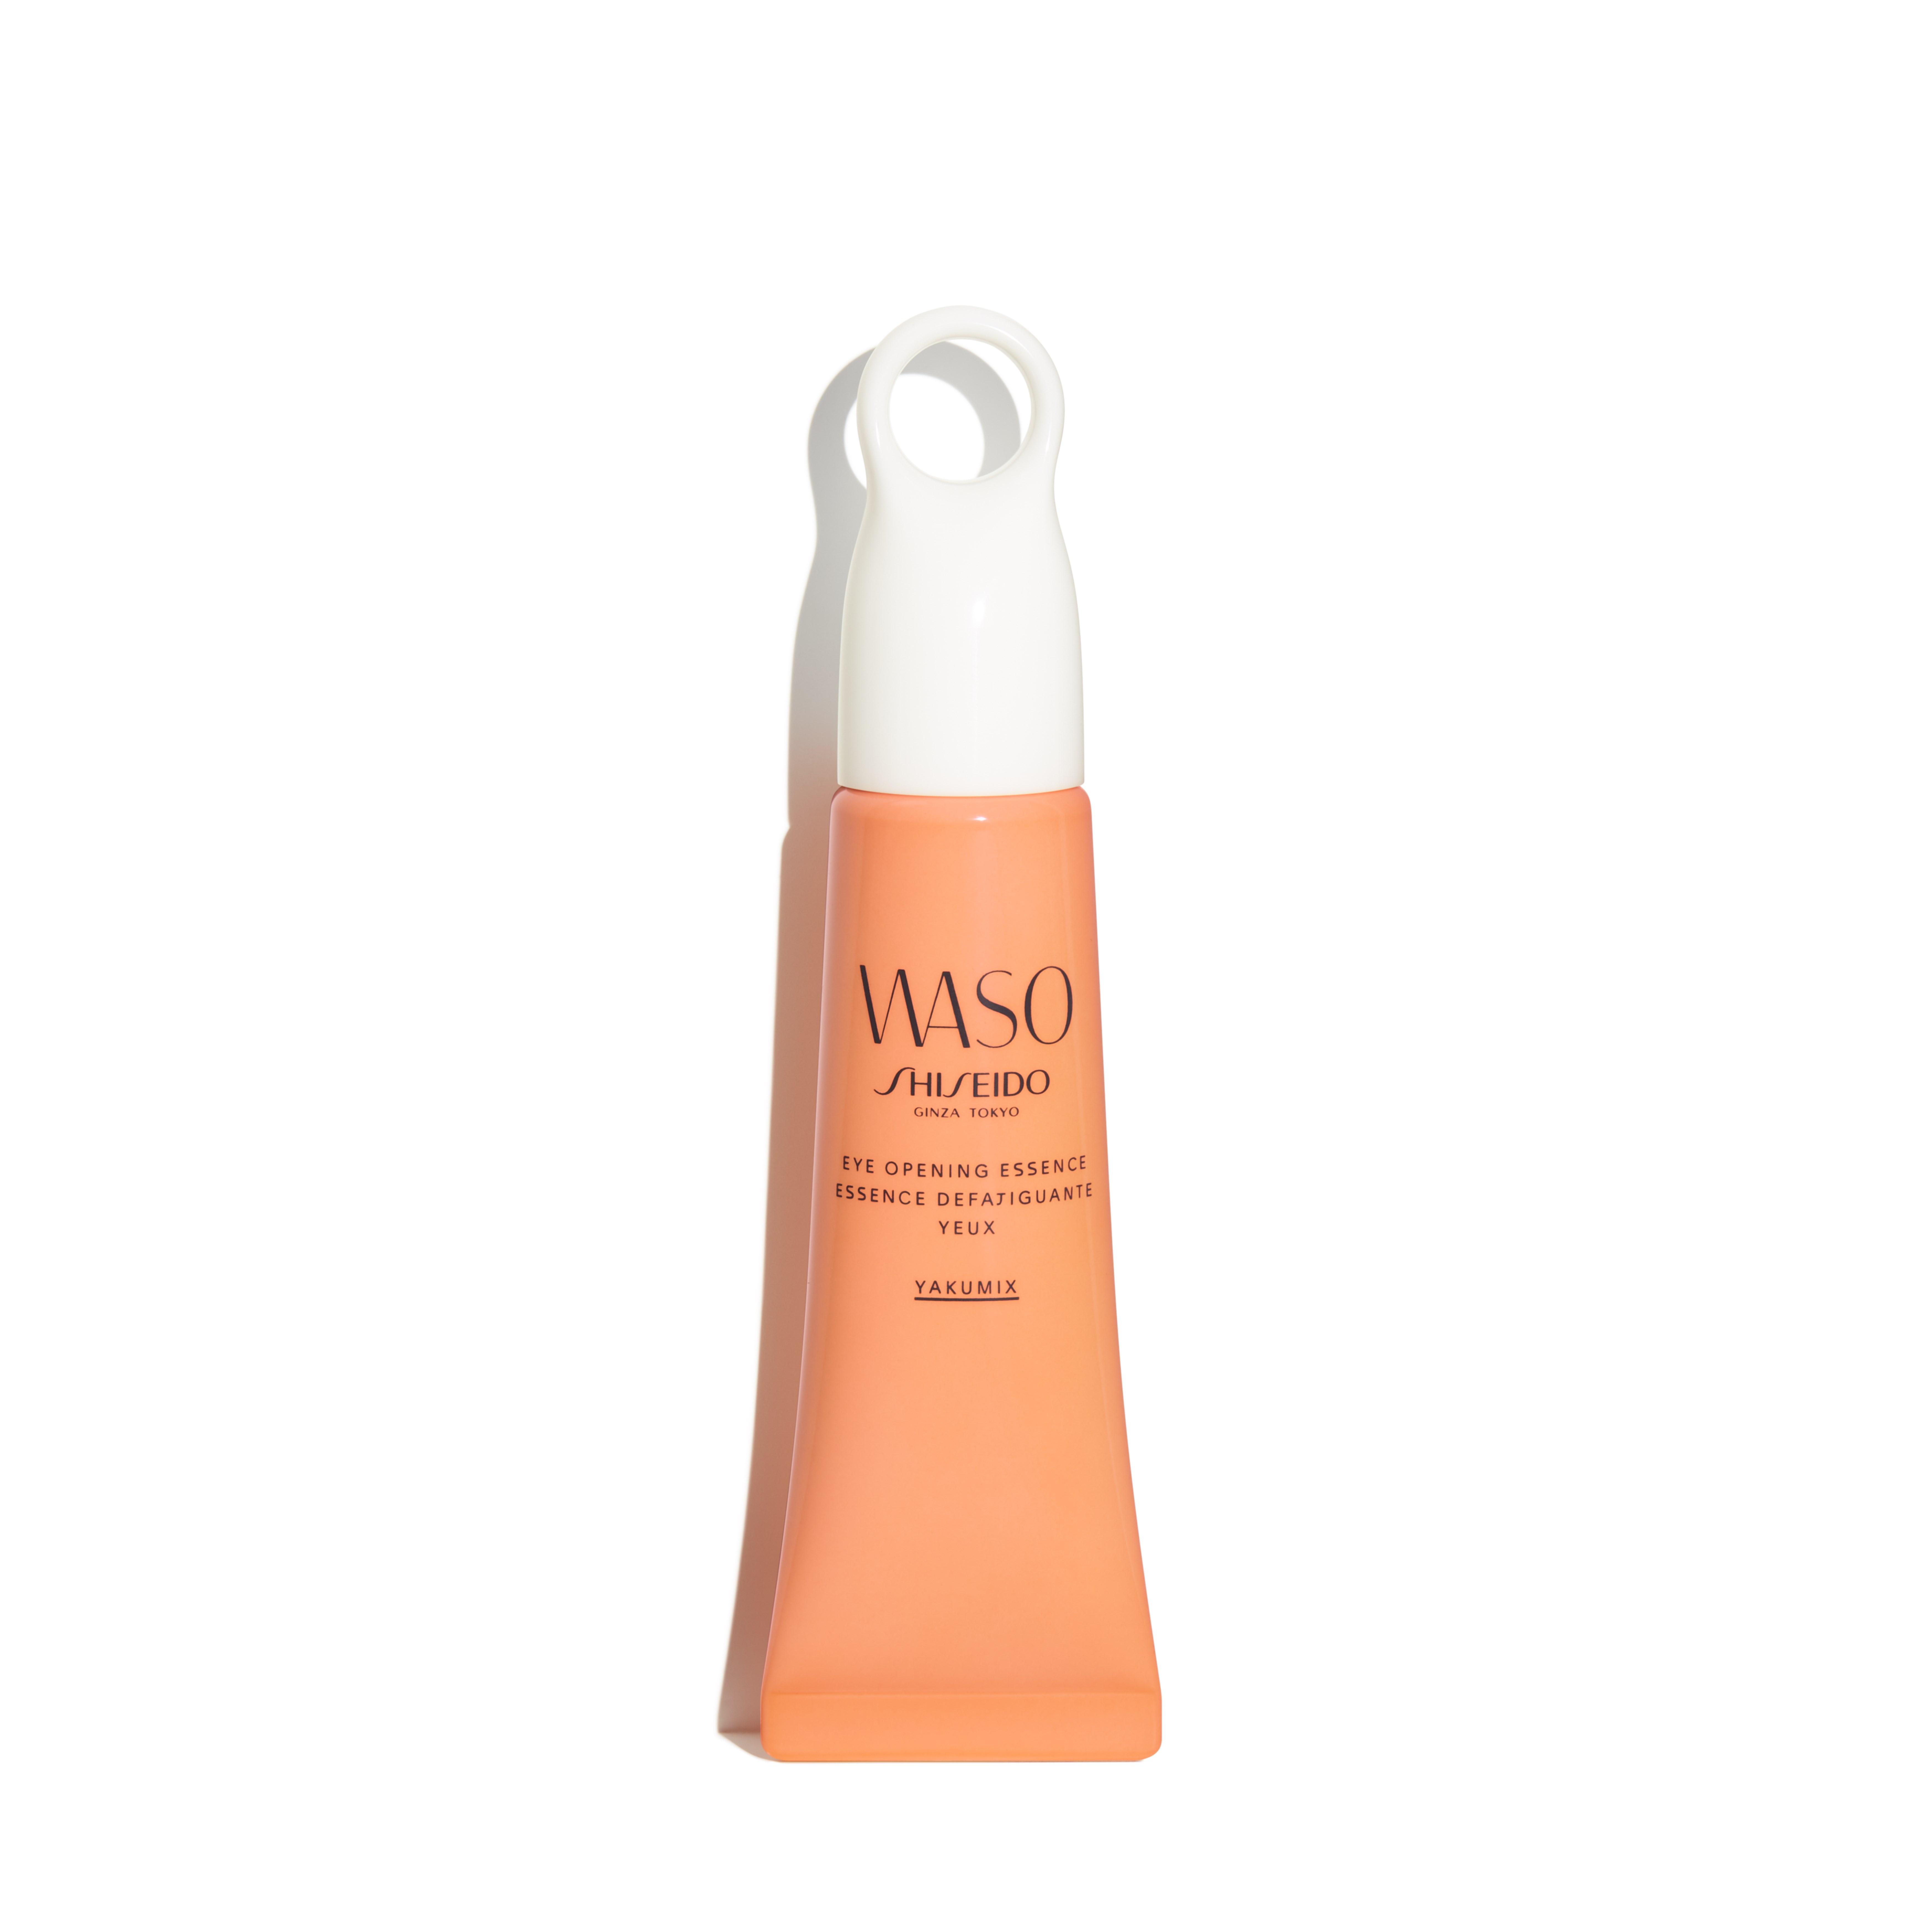 1570197384_Shiseido_Waso_Eye_Opening_Essence__3_